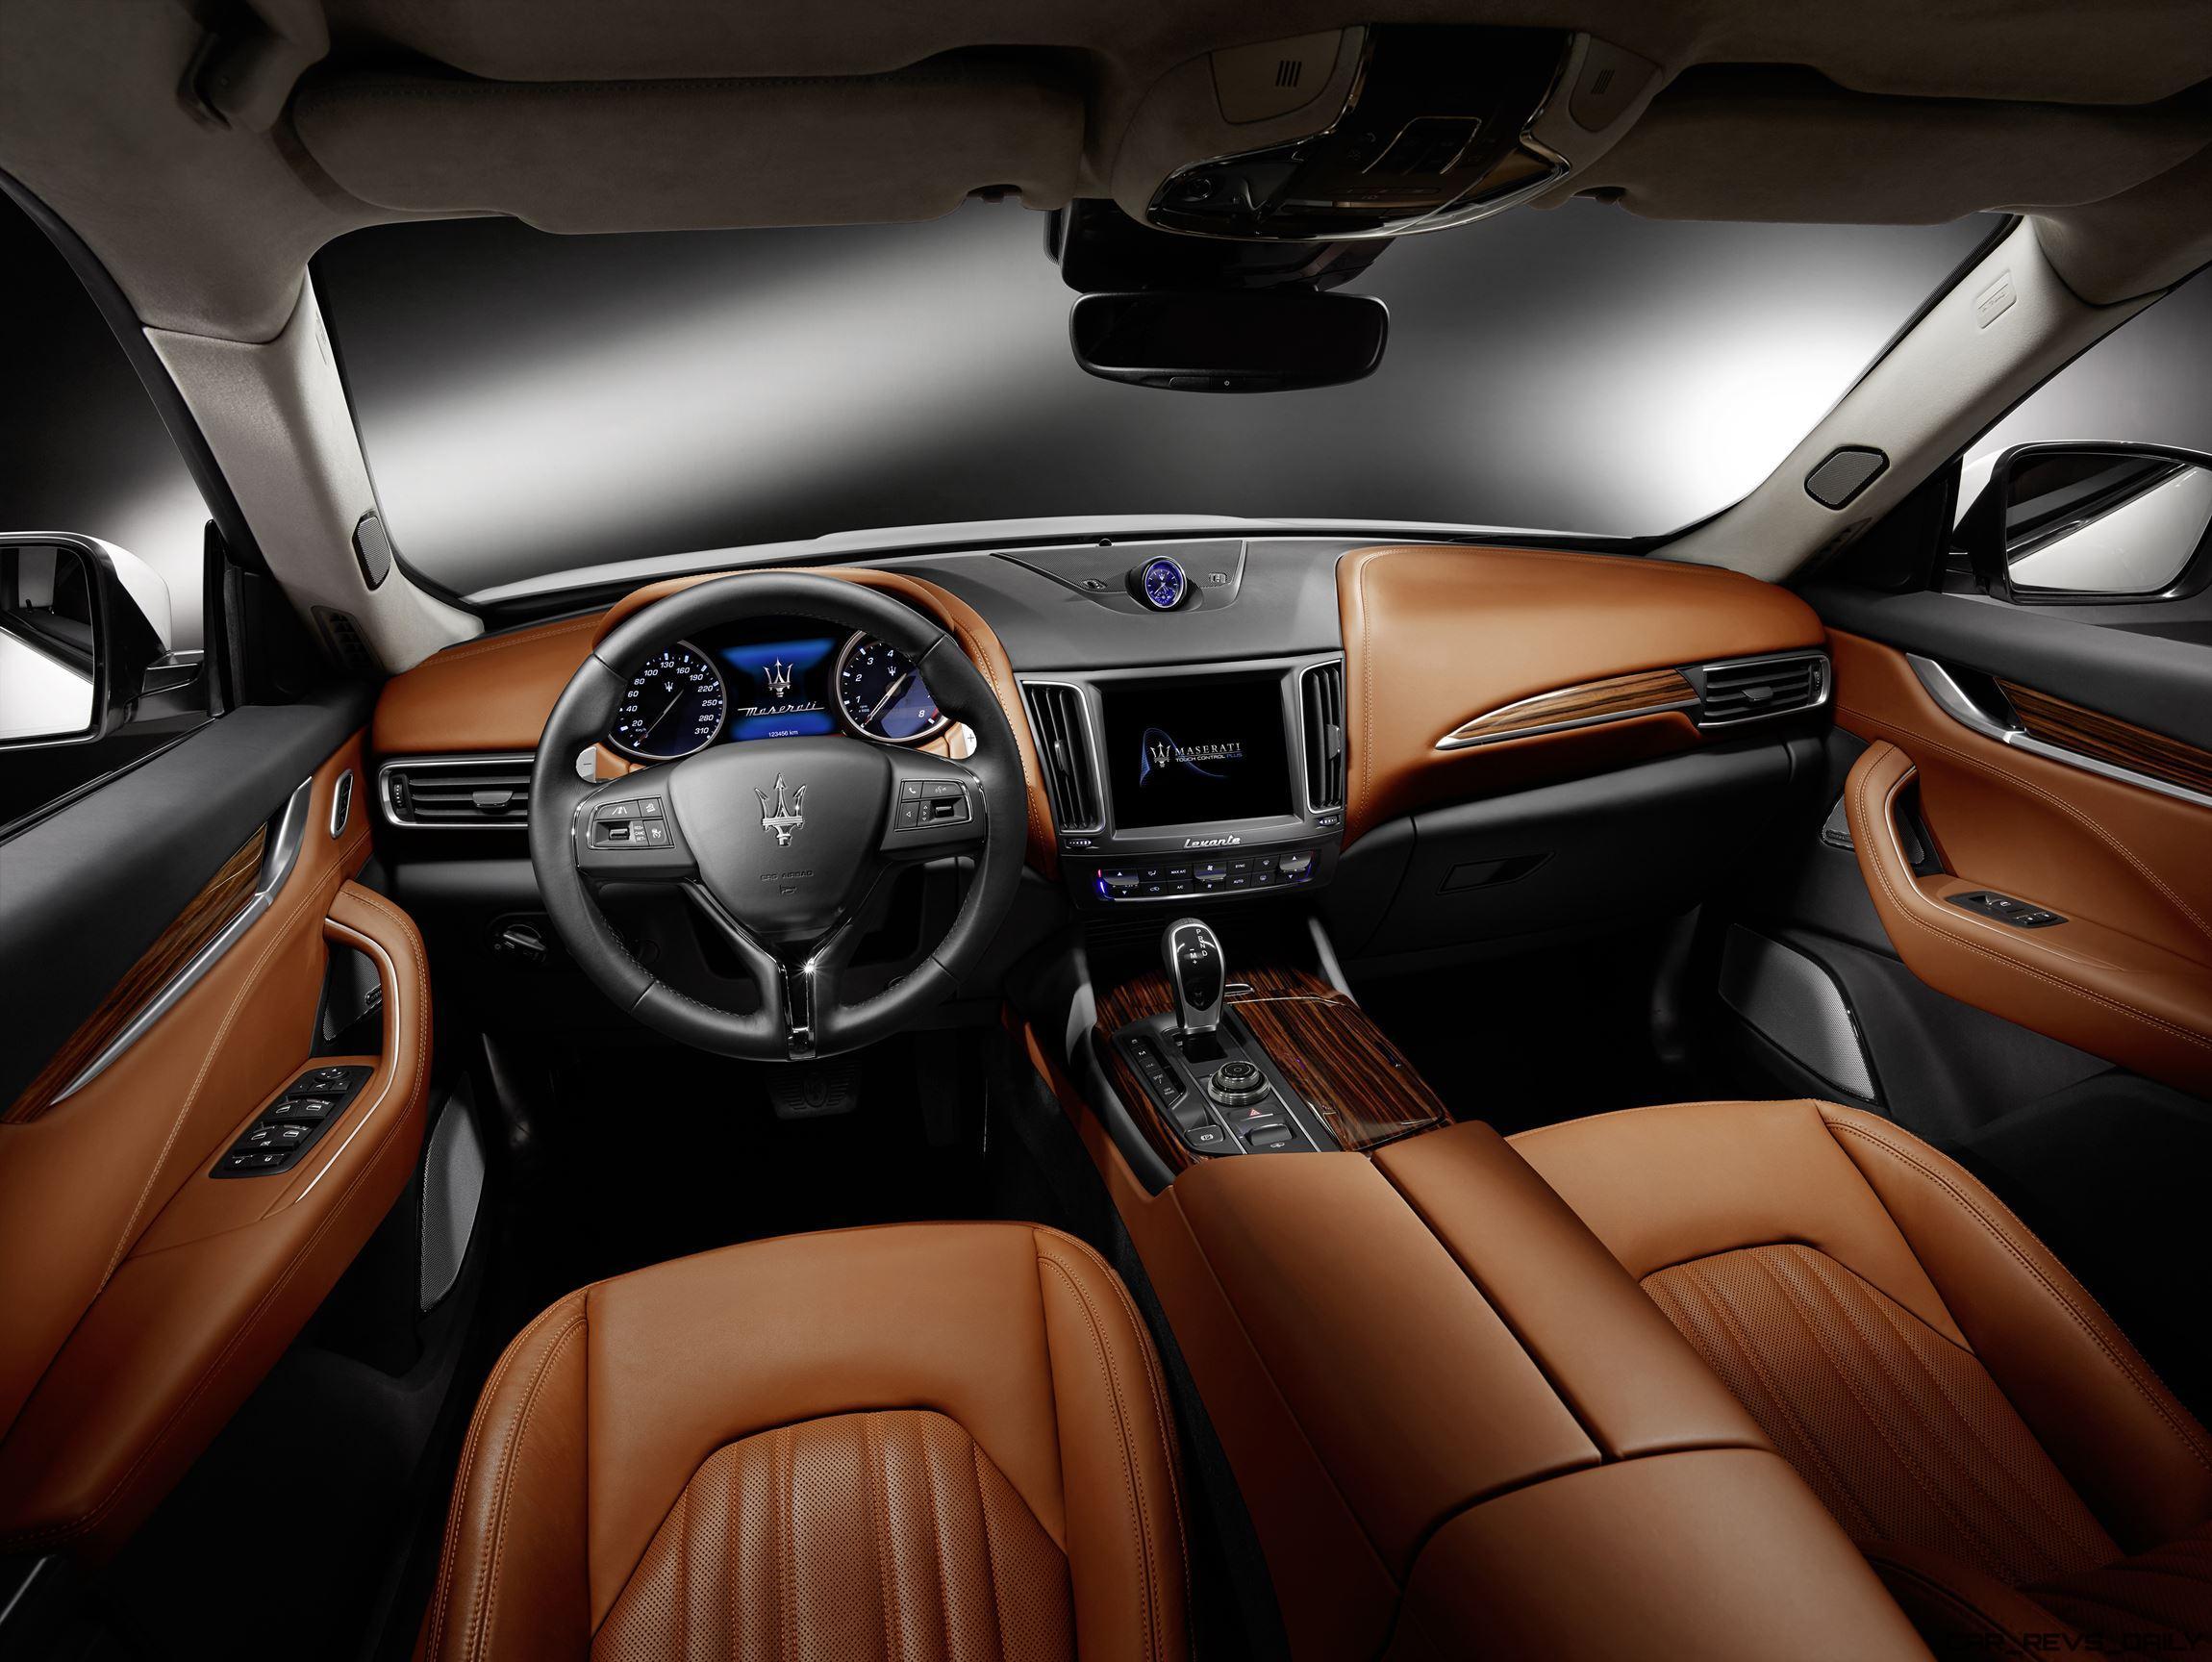 2017-Maserati-Levante-Interior-4